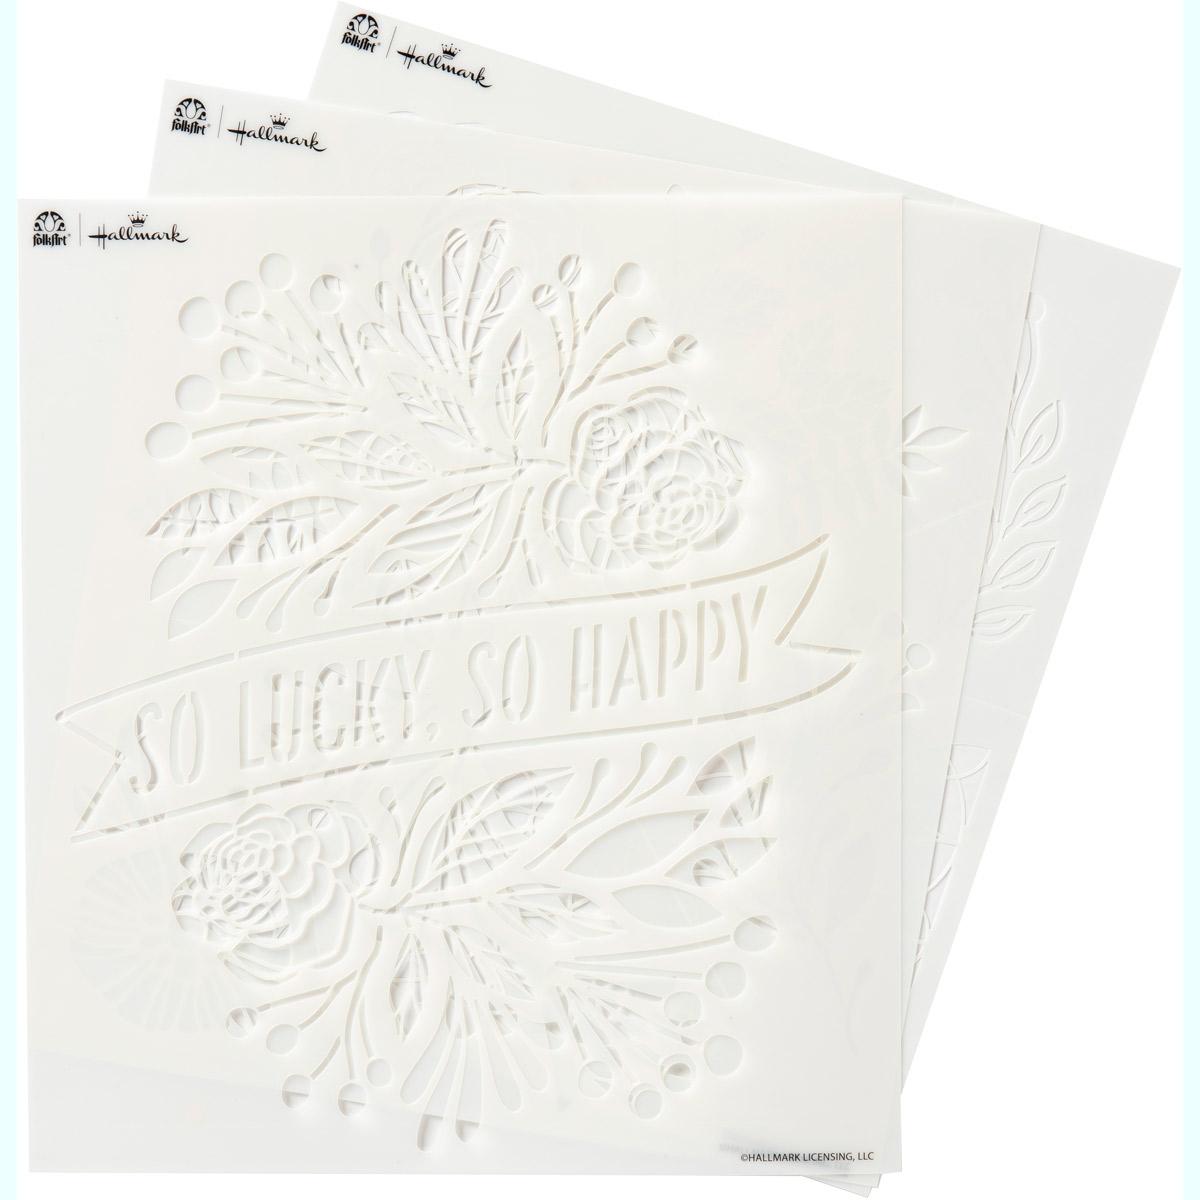 Hallmark Handcrafted Adhesive Stencils - So Happy Design Pack, 8-1/2